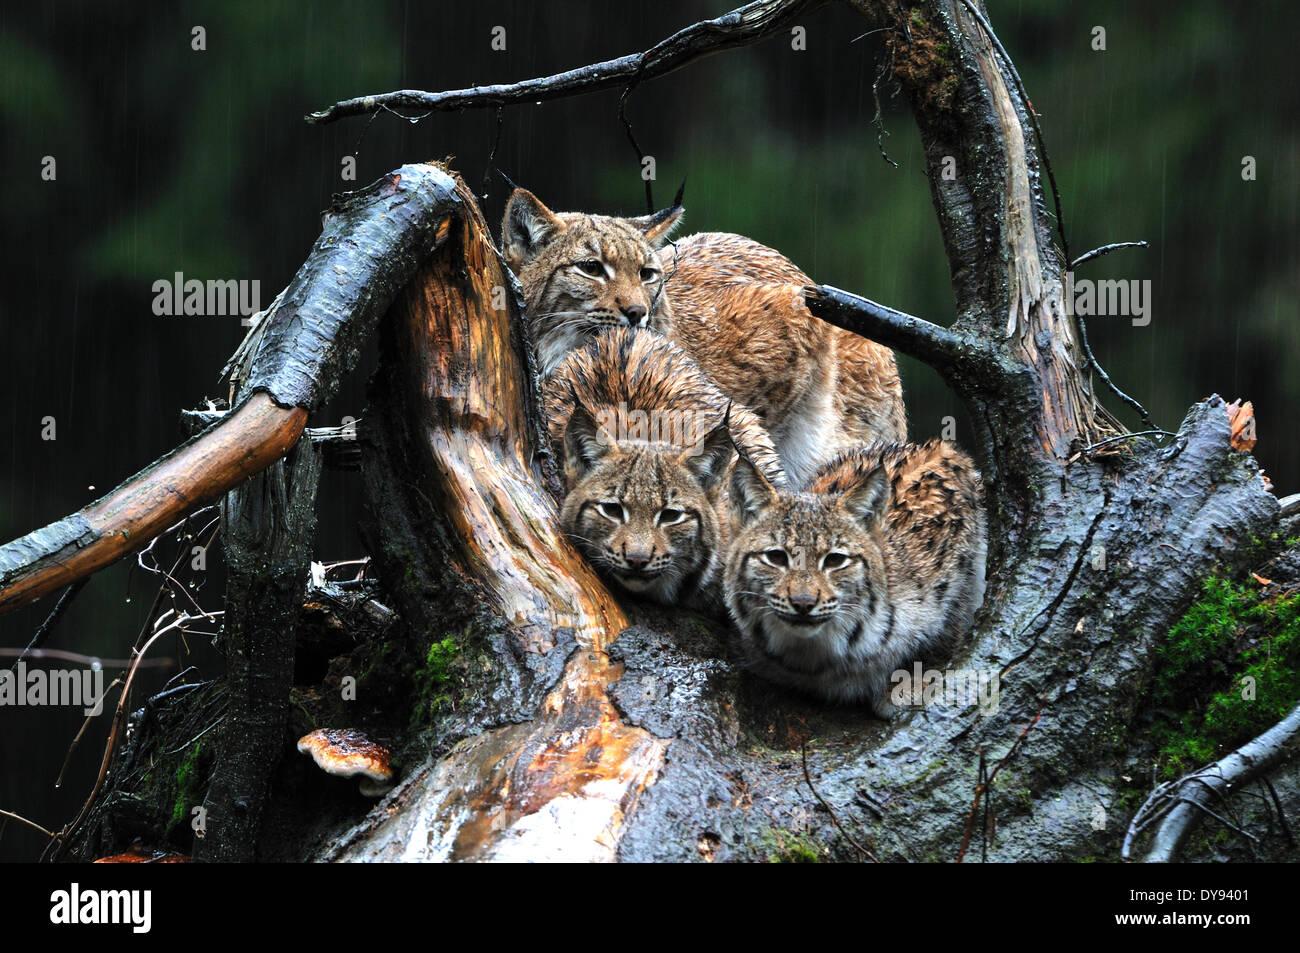 Lynx cat big cat predator cats wildcat big cats lynxes fur animals winter winter lynx snow Lynx lynx Eurasian lynx - Stock Image